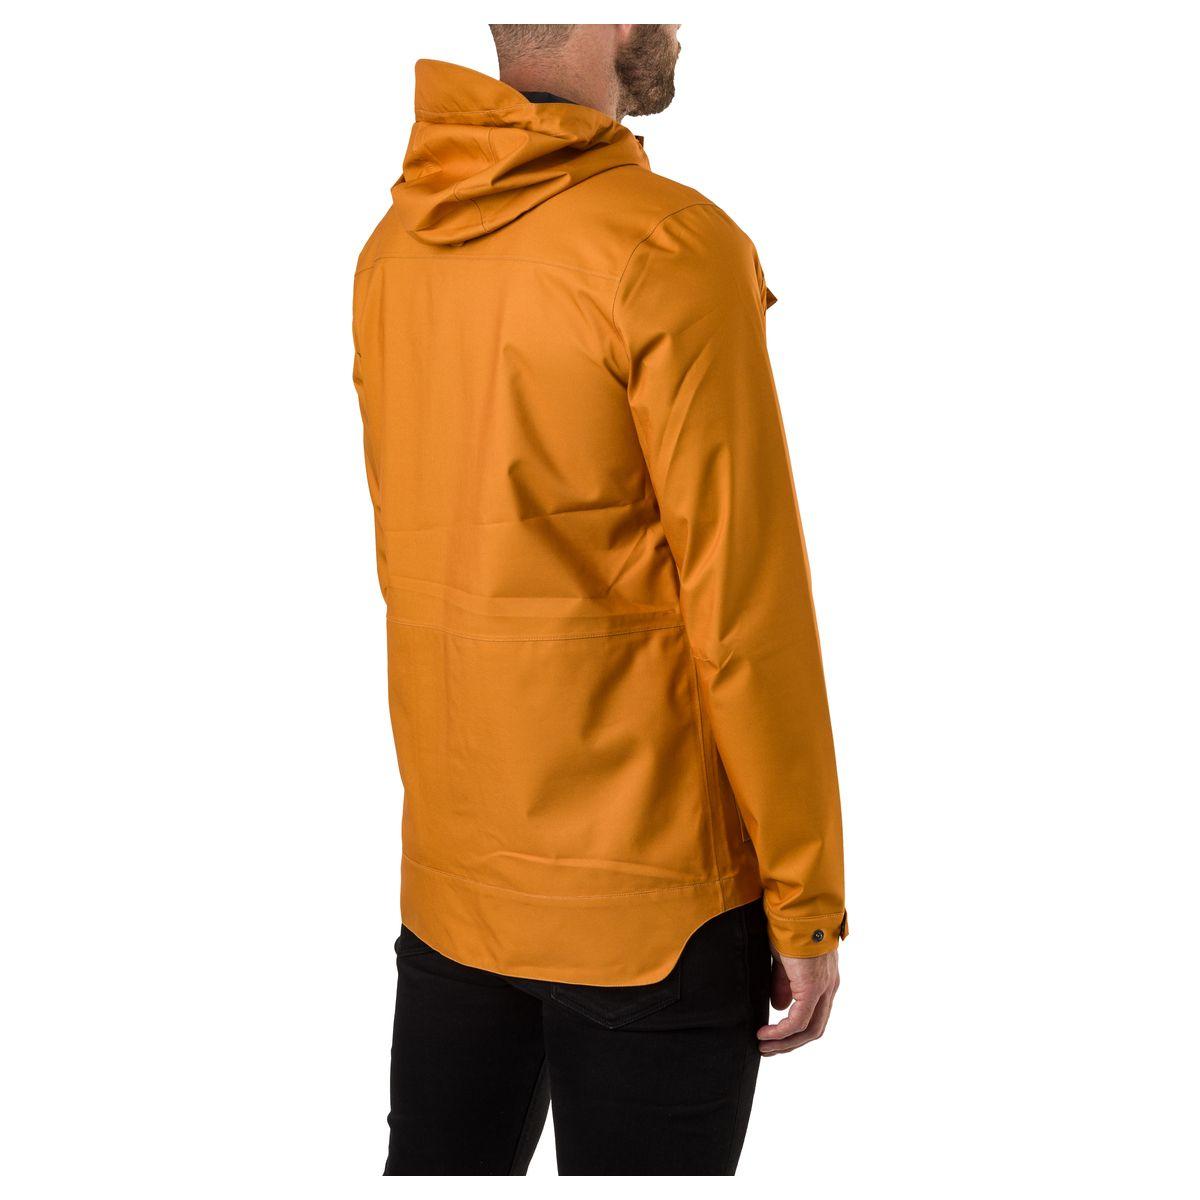 Pocket Veste imperméable Urban Outdoor Homme fit example